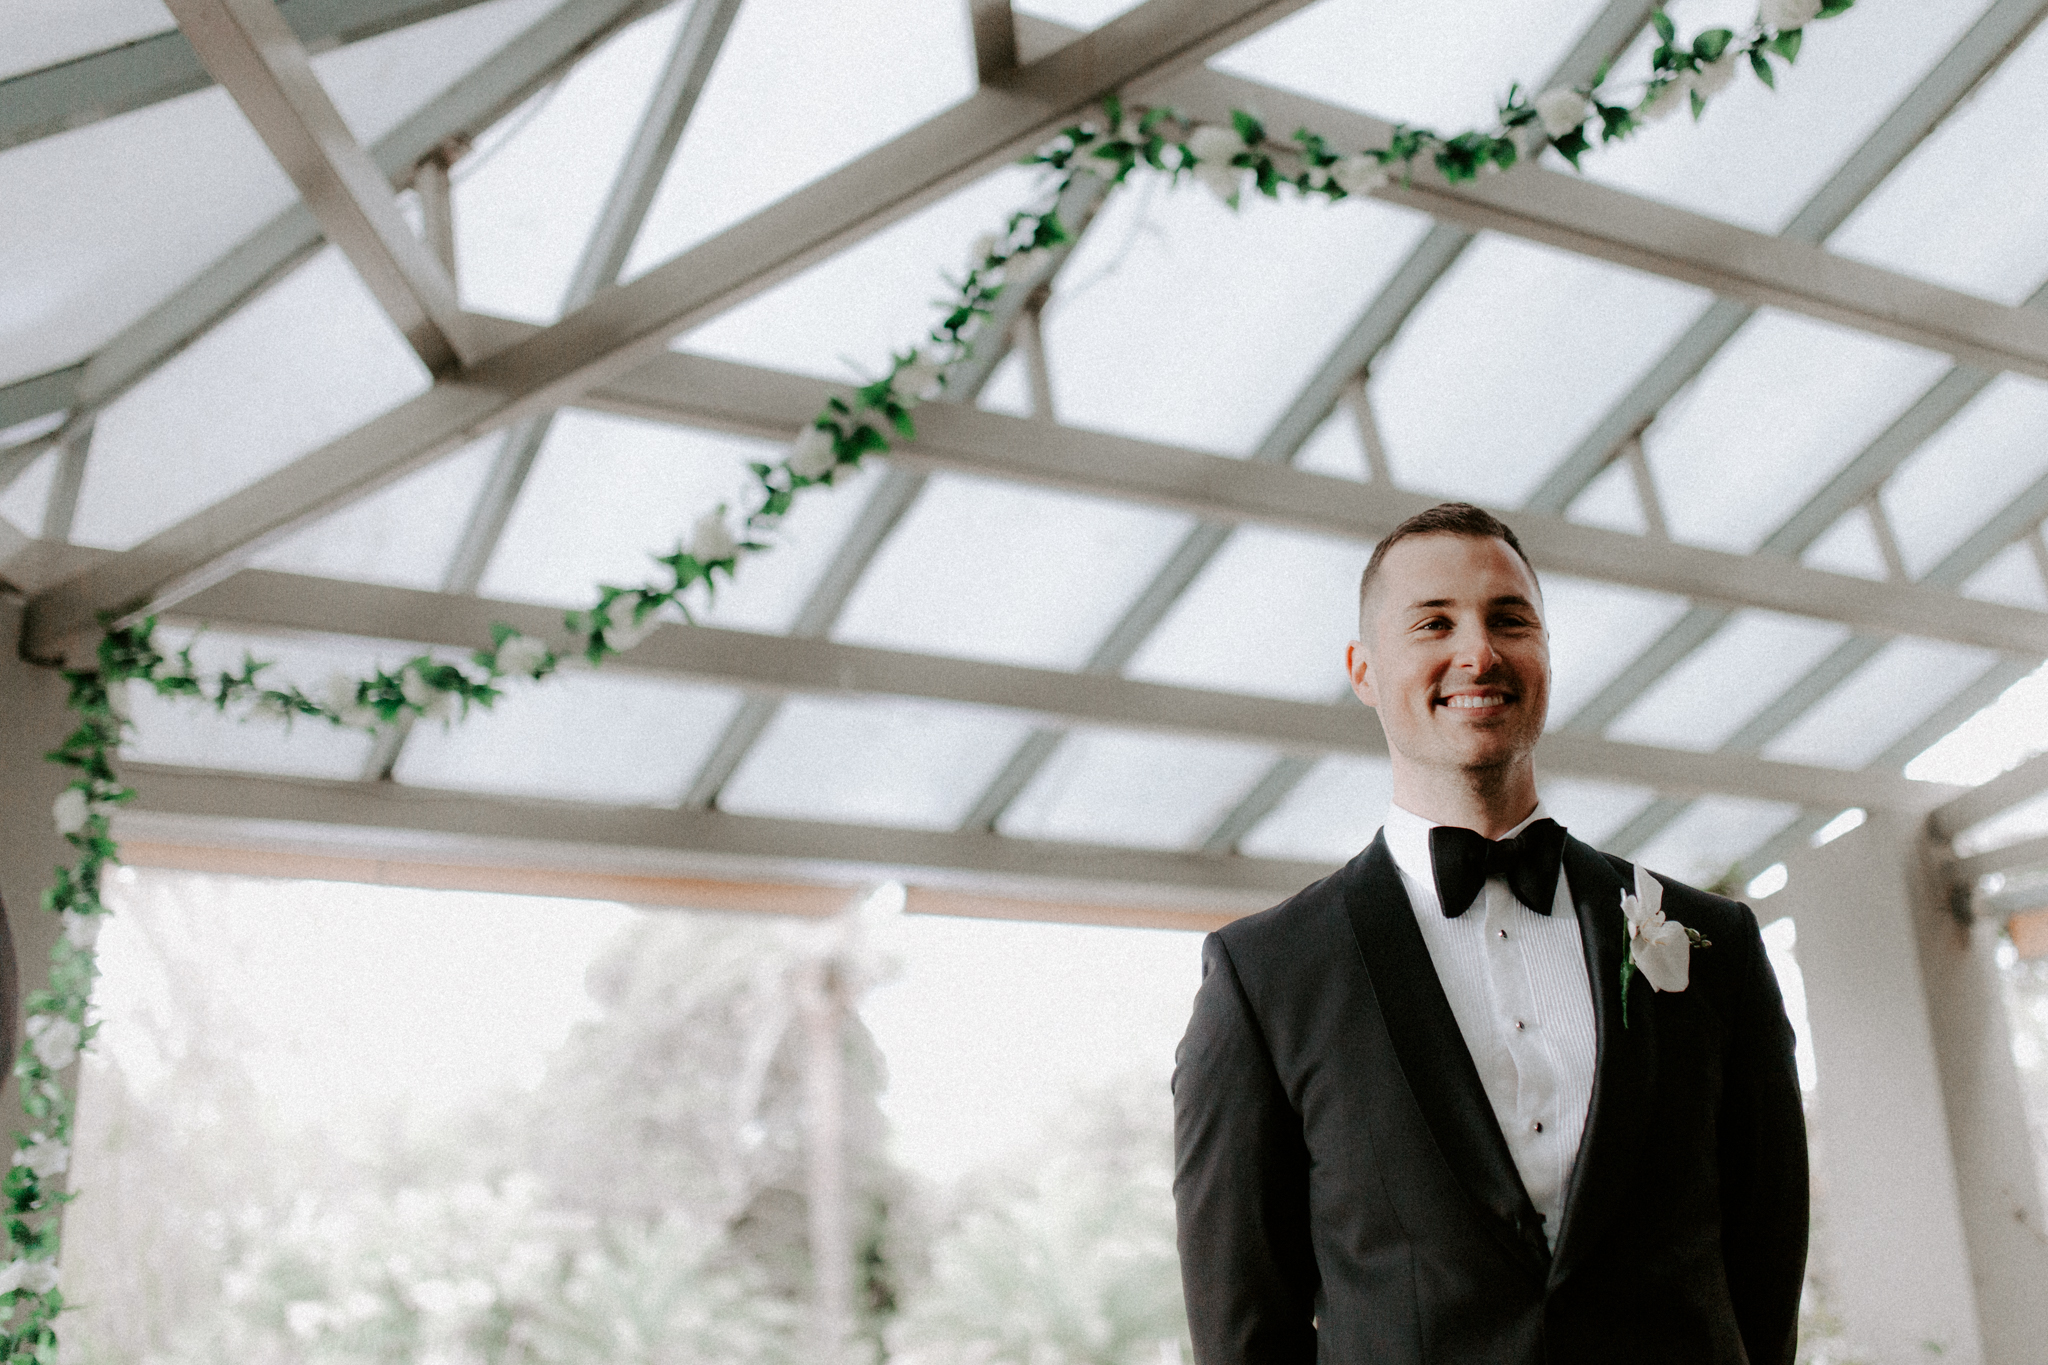 The-Terrace-Royal-Botanic-Gardens-Wedding-Emotions-and-Math-Photography-053.jpg